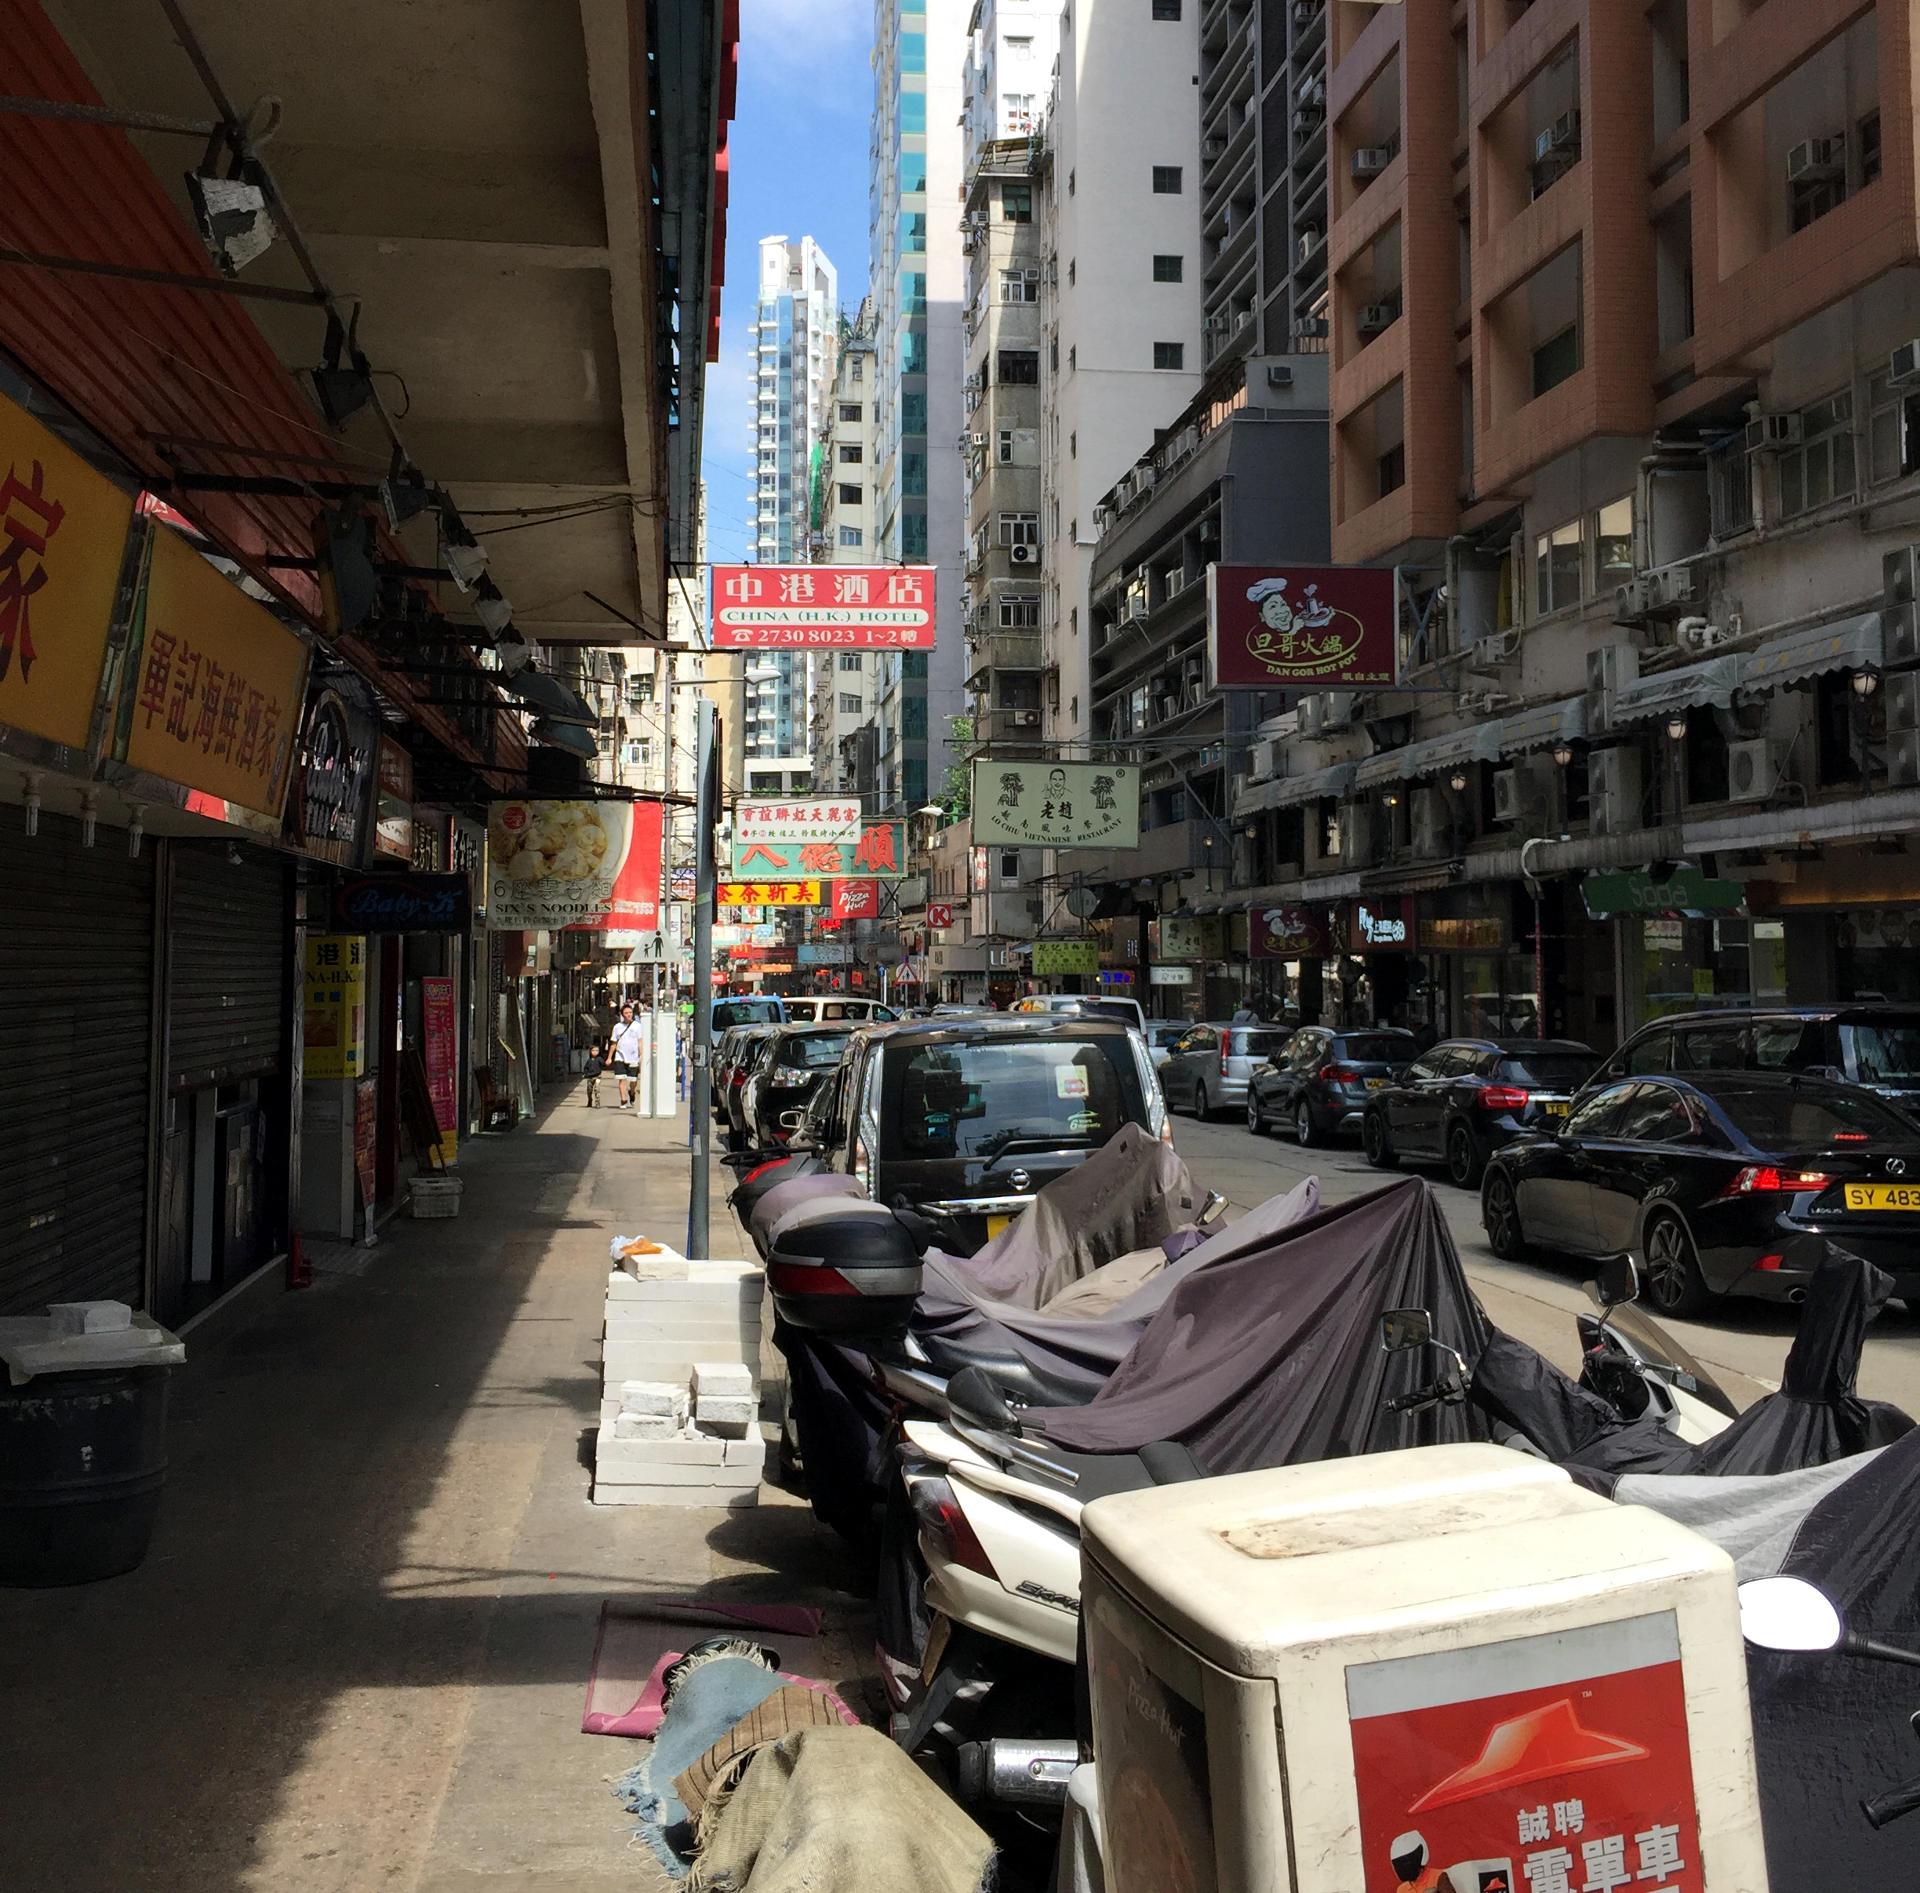 hongkong ulice miasto dzielnice iglawpodrozy